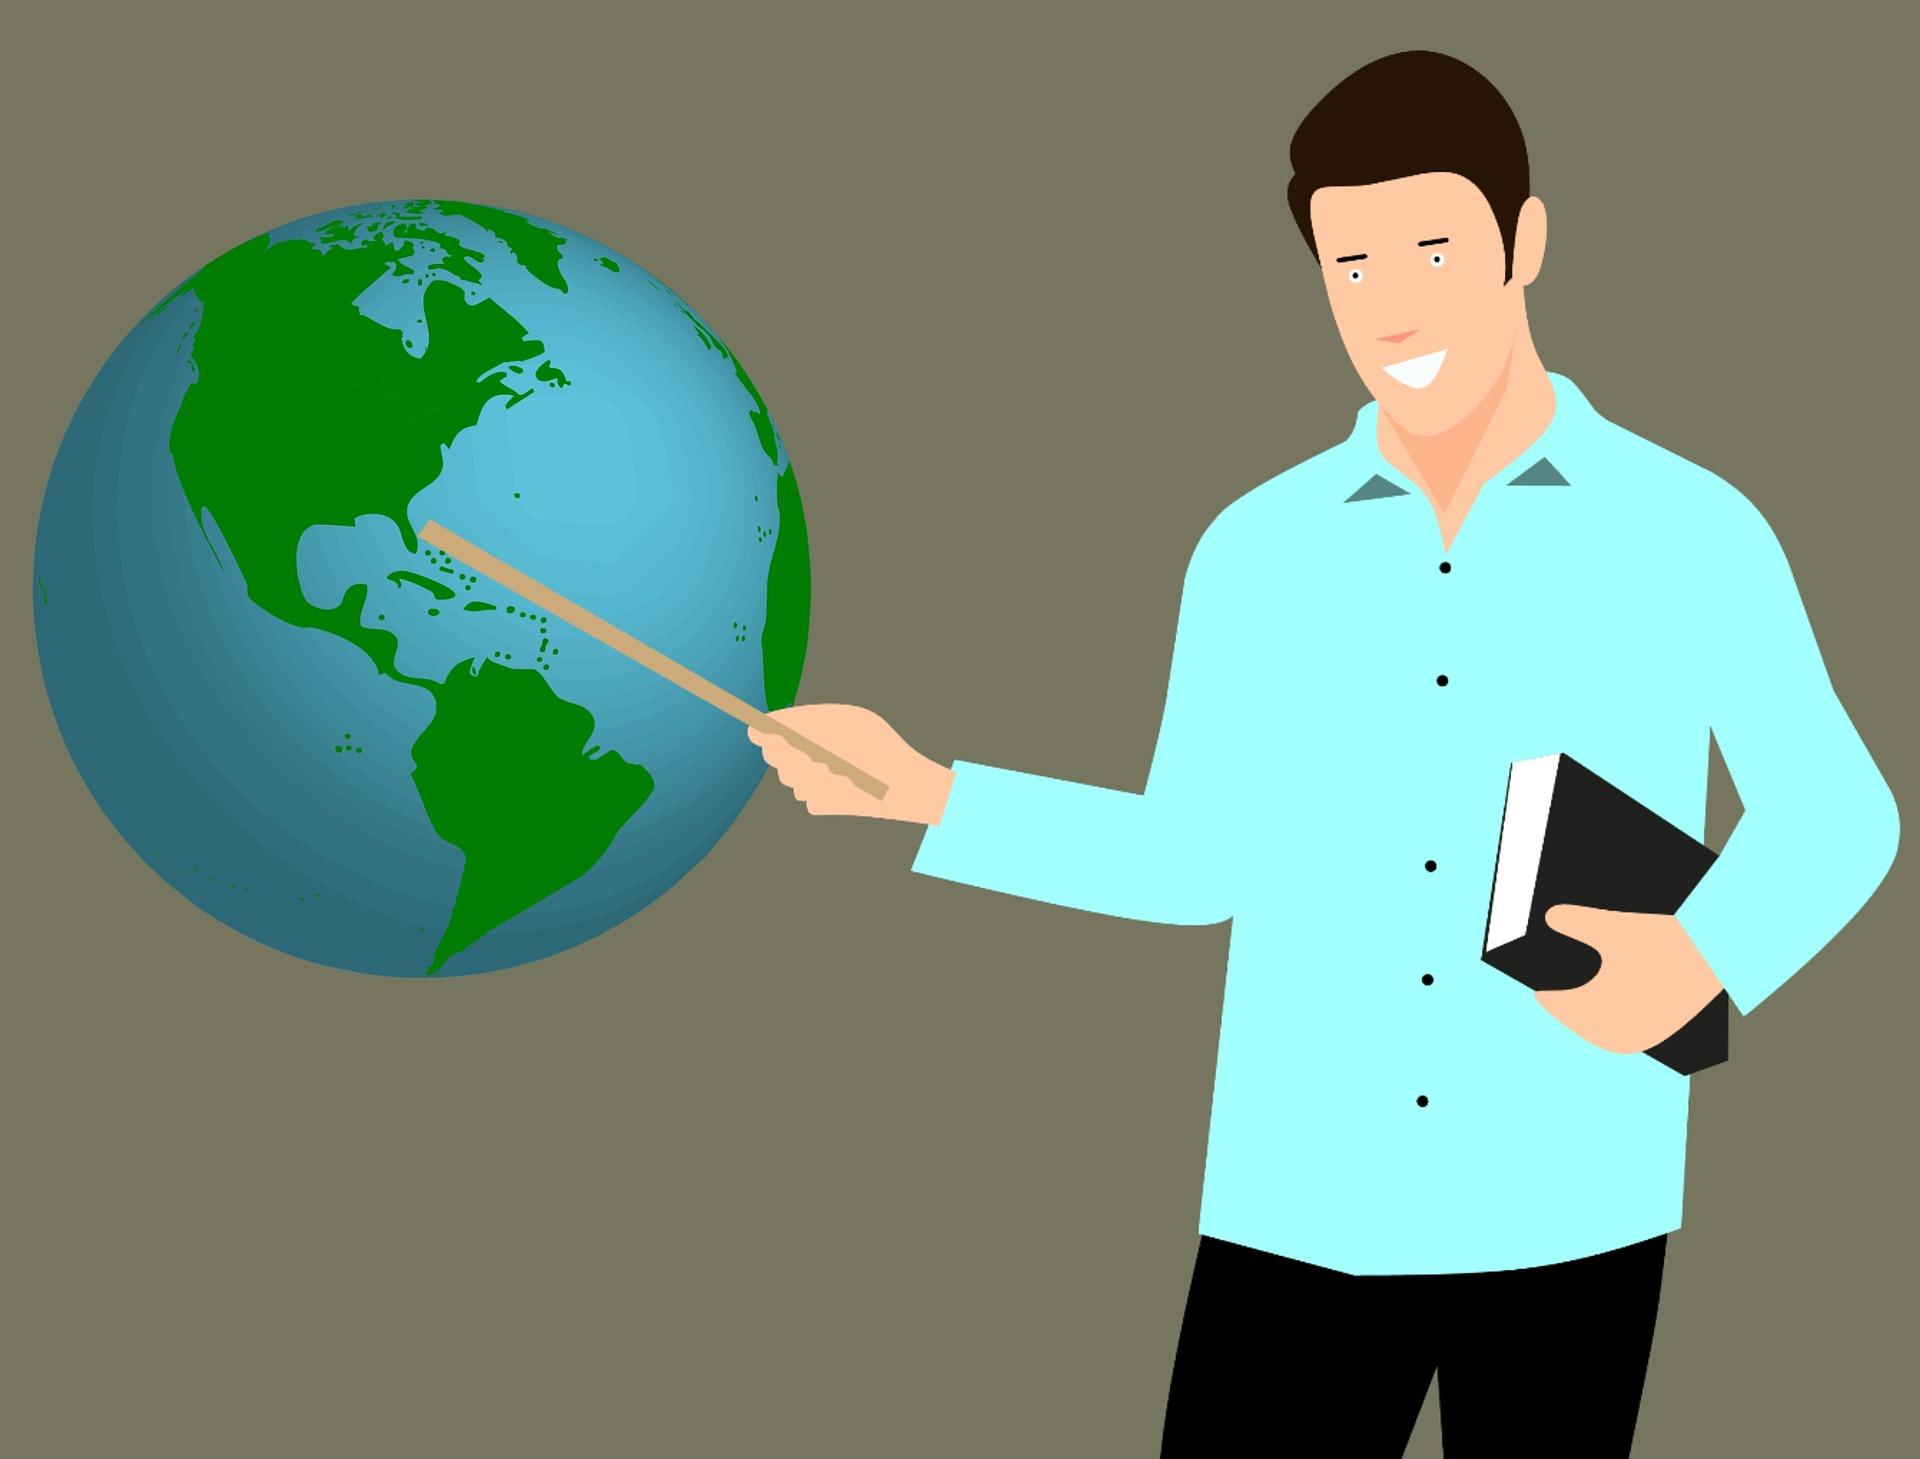 Apotheke Digitalisierung PLZ Code Lebenserwartung Geografie Demografie